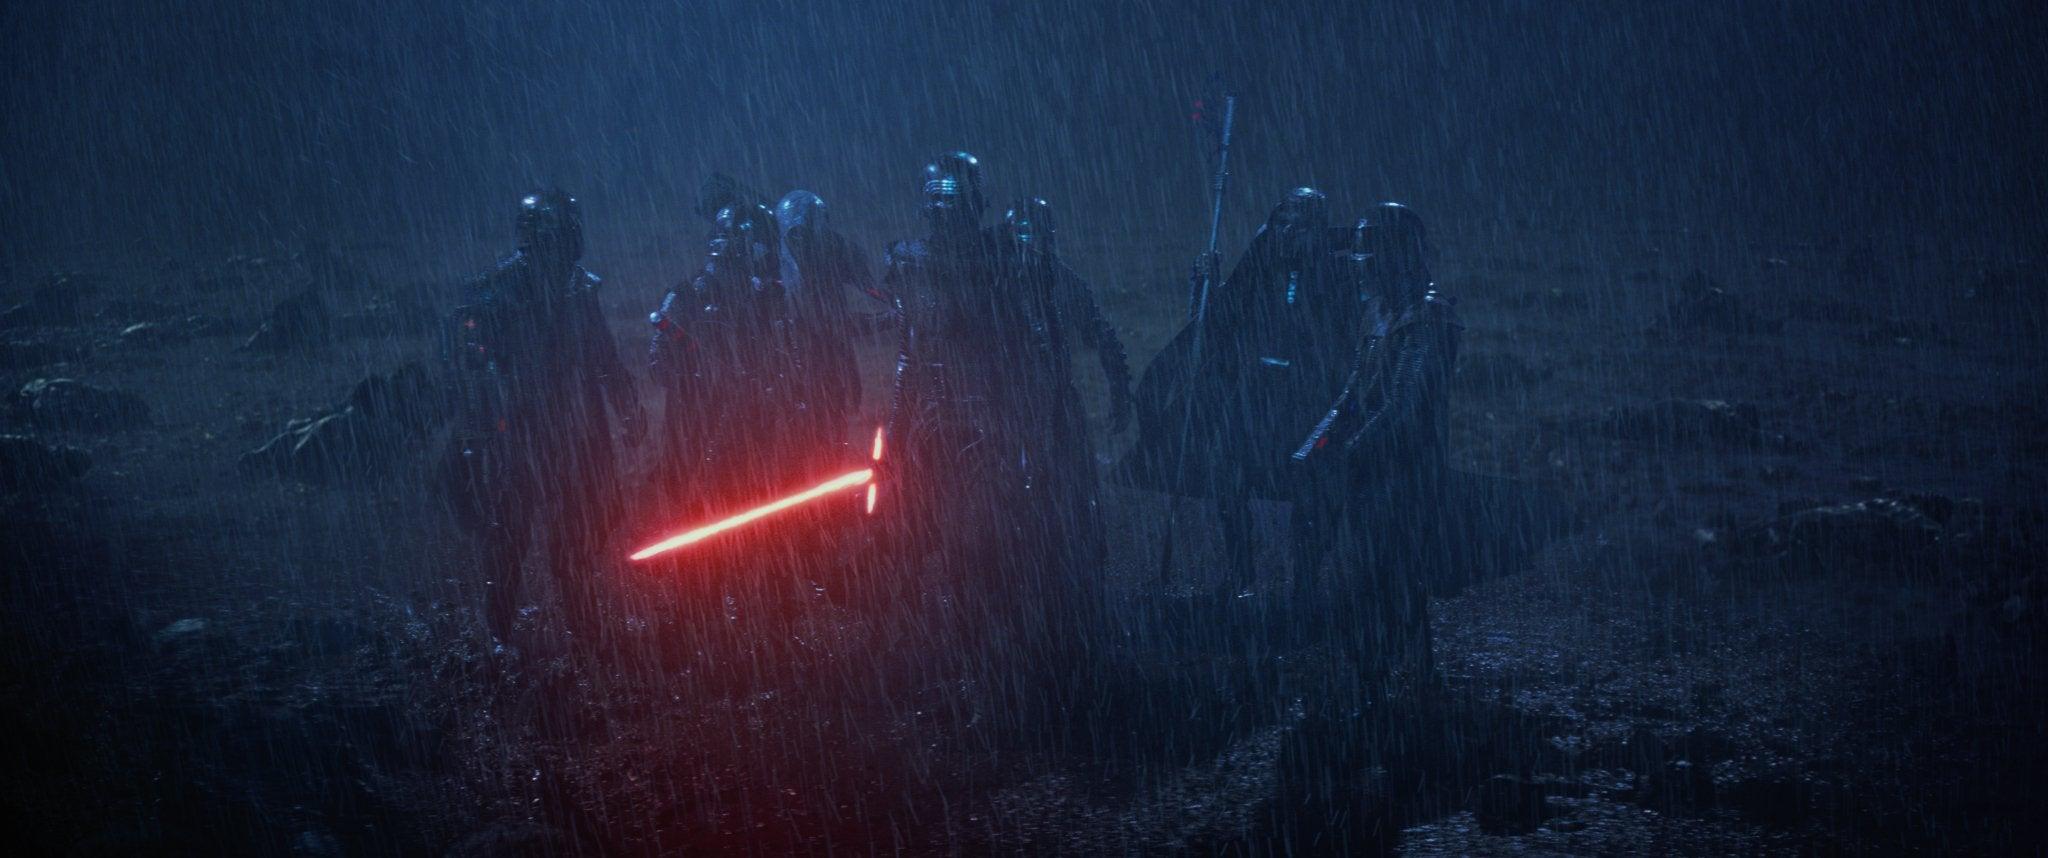 Star Wars: Episode VIII May IncludeThis Amazing Action Scene